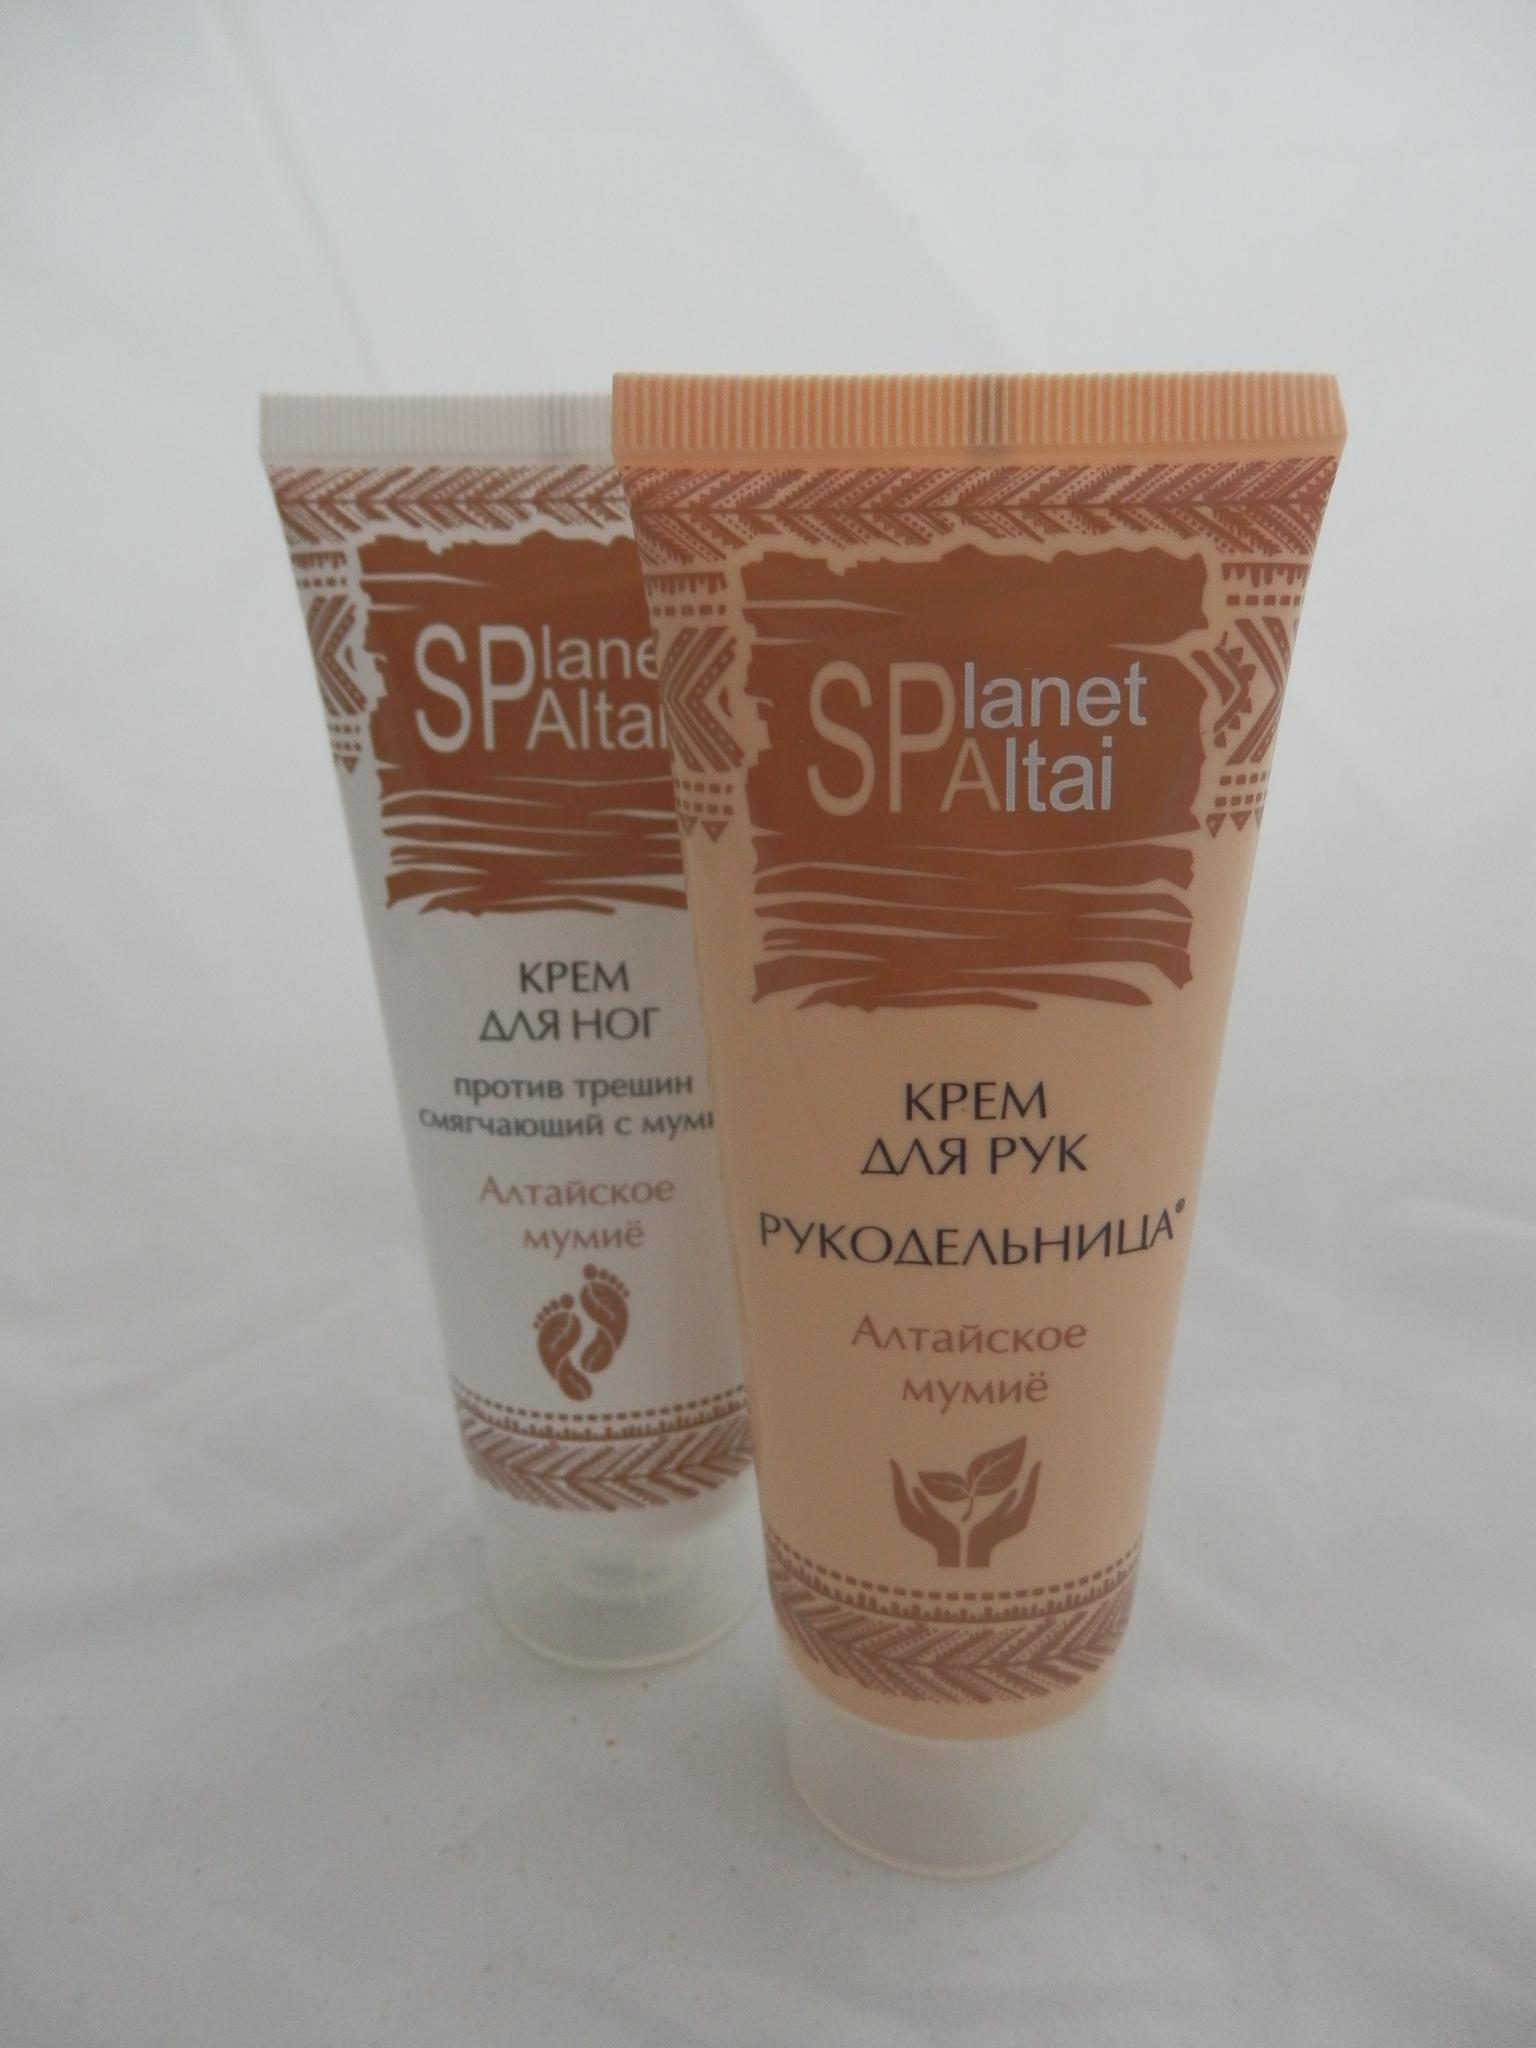 Planet SPA Altai Крем для ног против трещин смягчающий с мумиё фото2